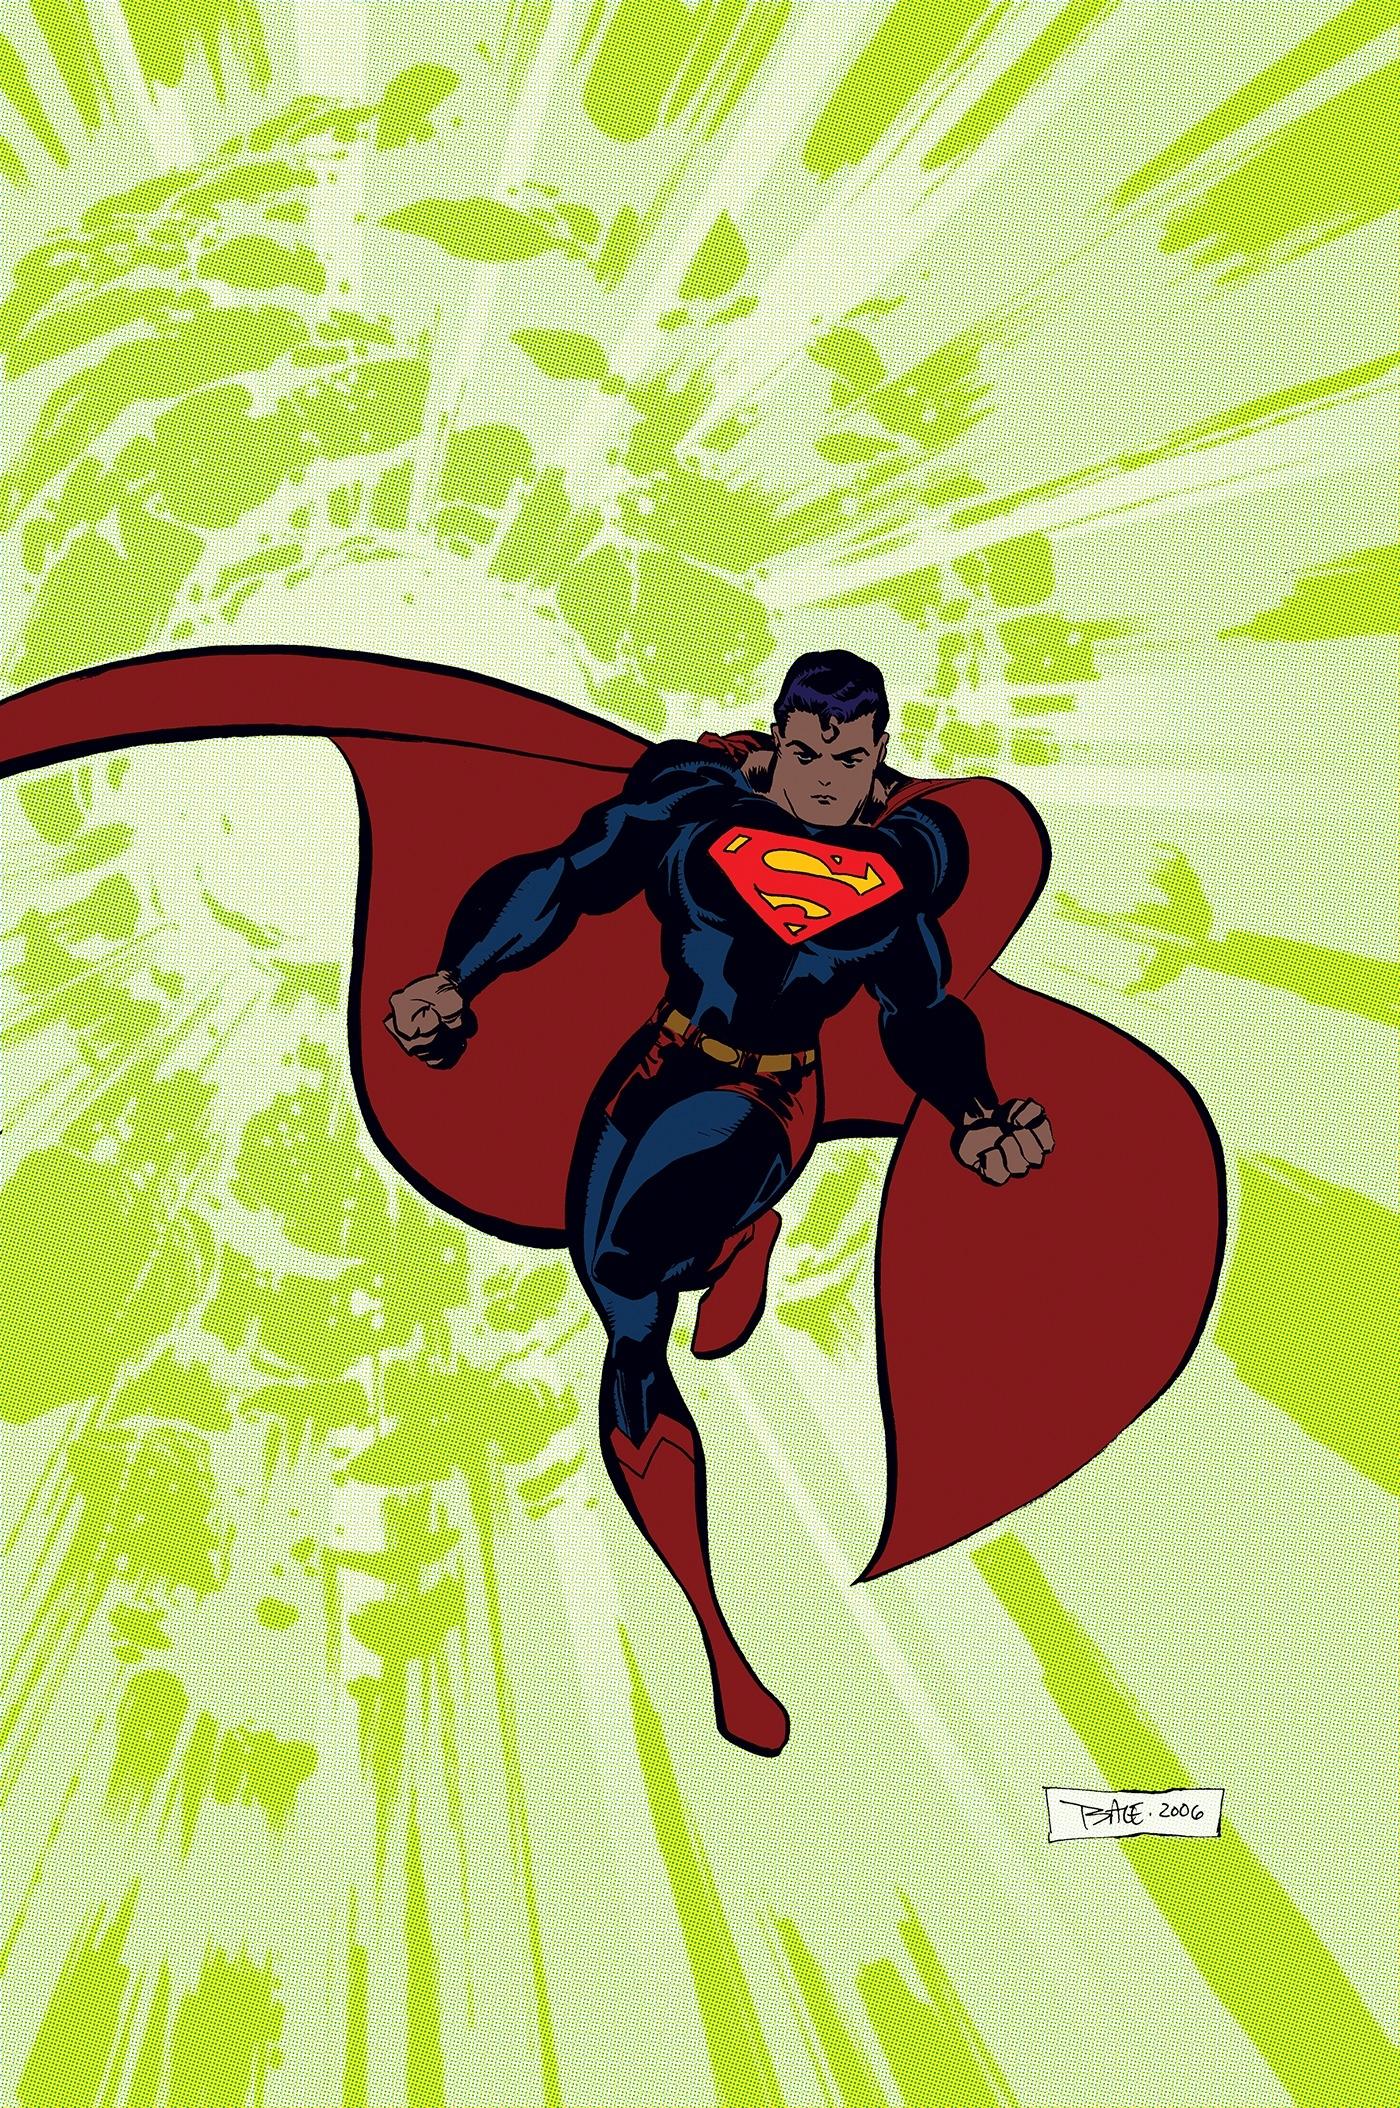 dc67d2ec Superman Kryptonite Deluxe Edition by Darwyn Cooke - Penguin Books ...